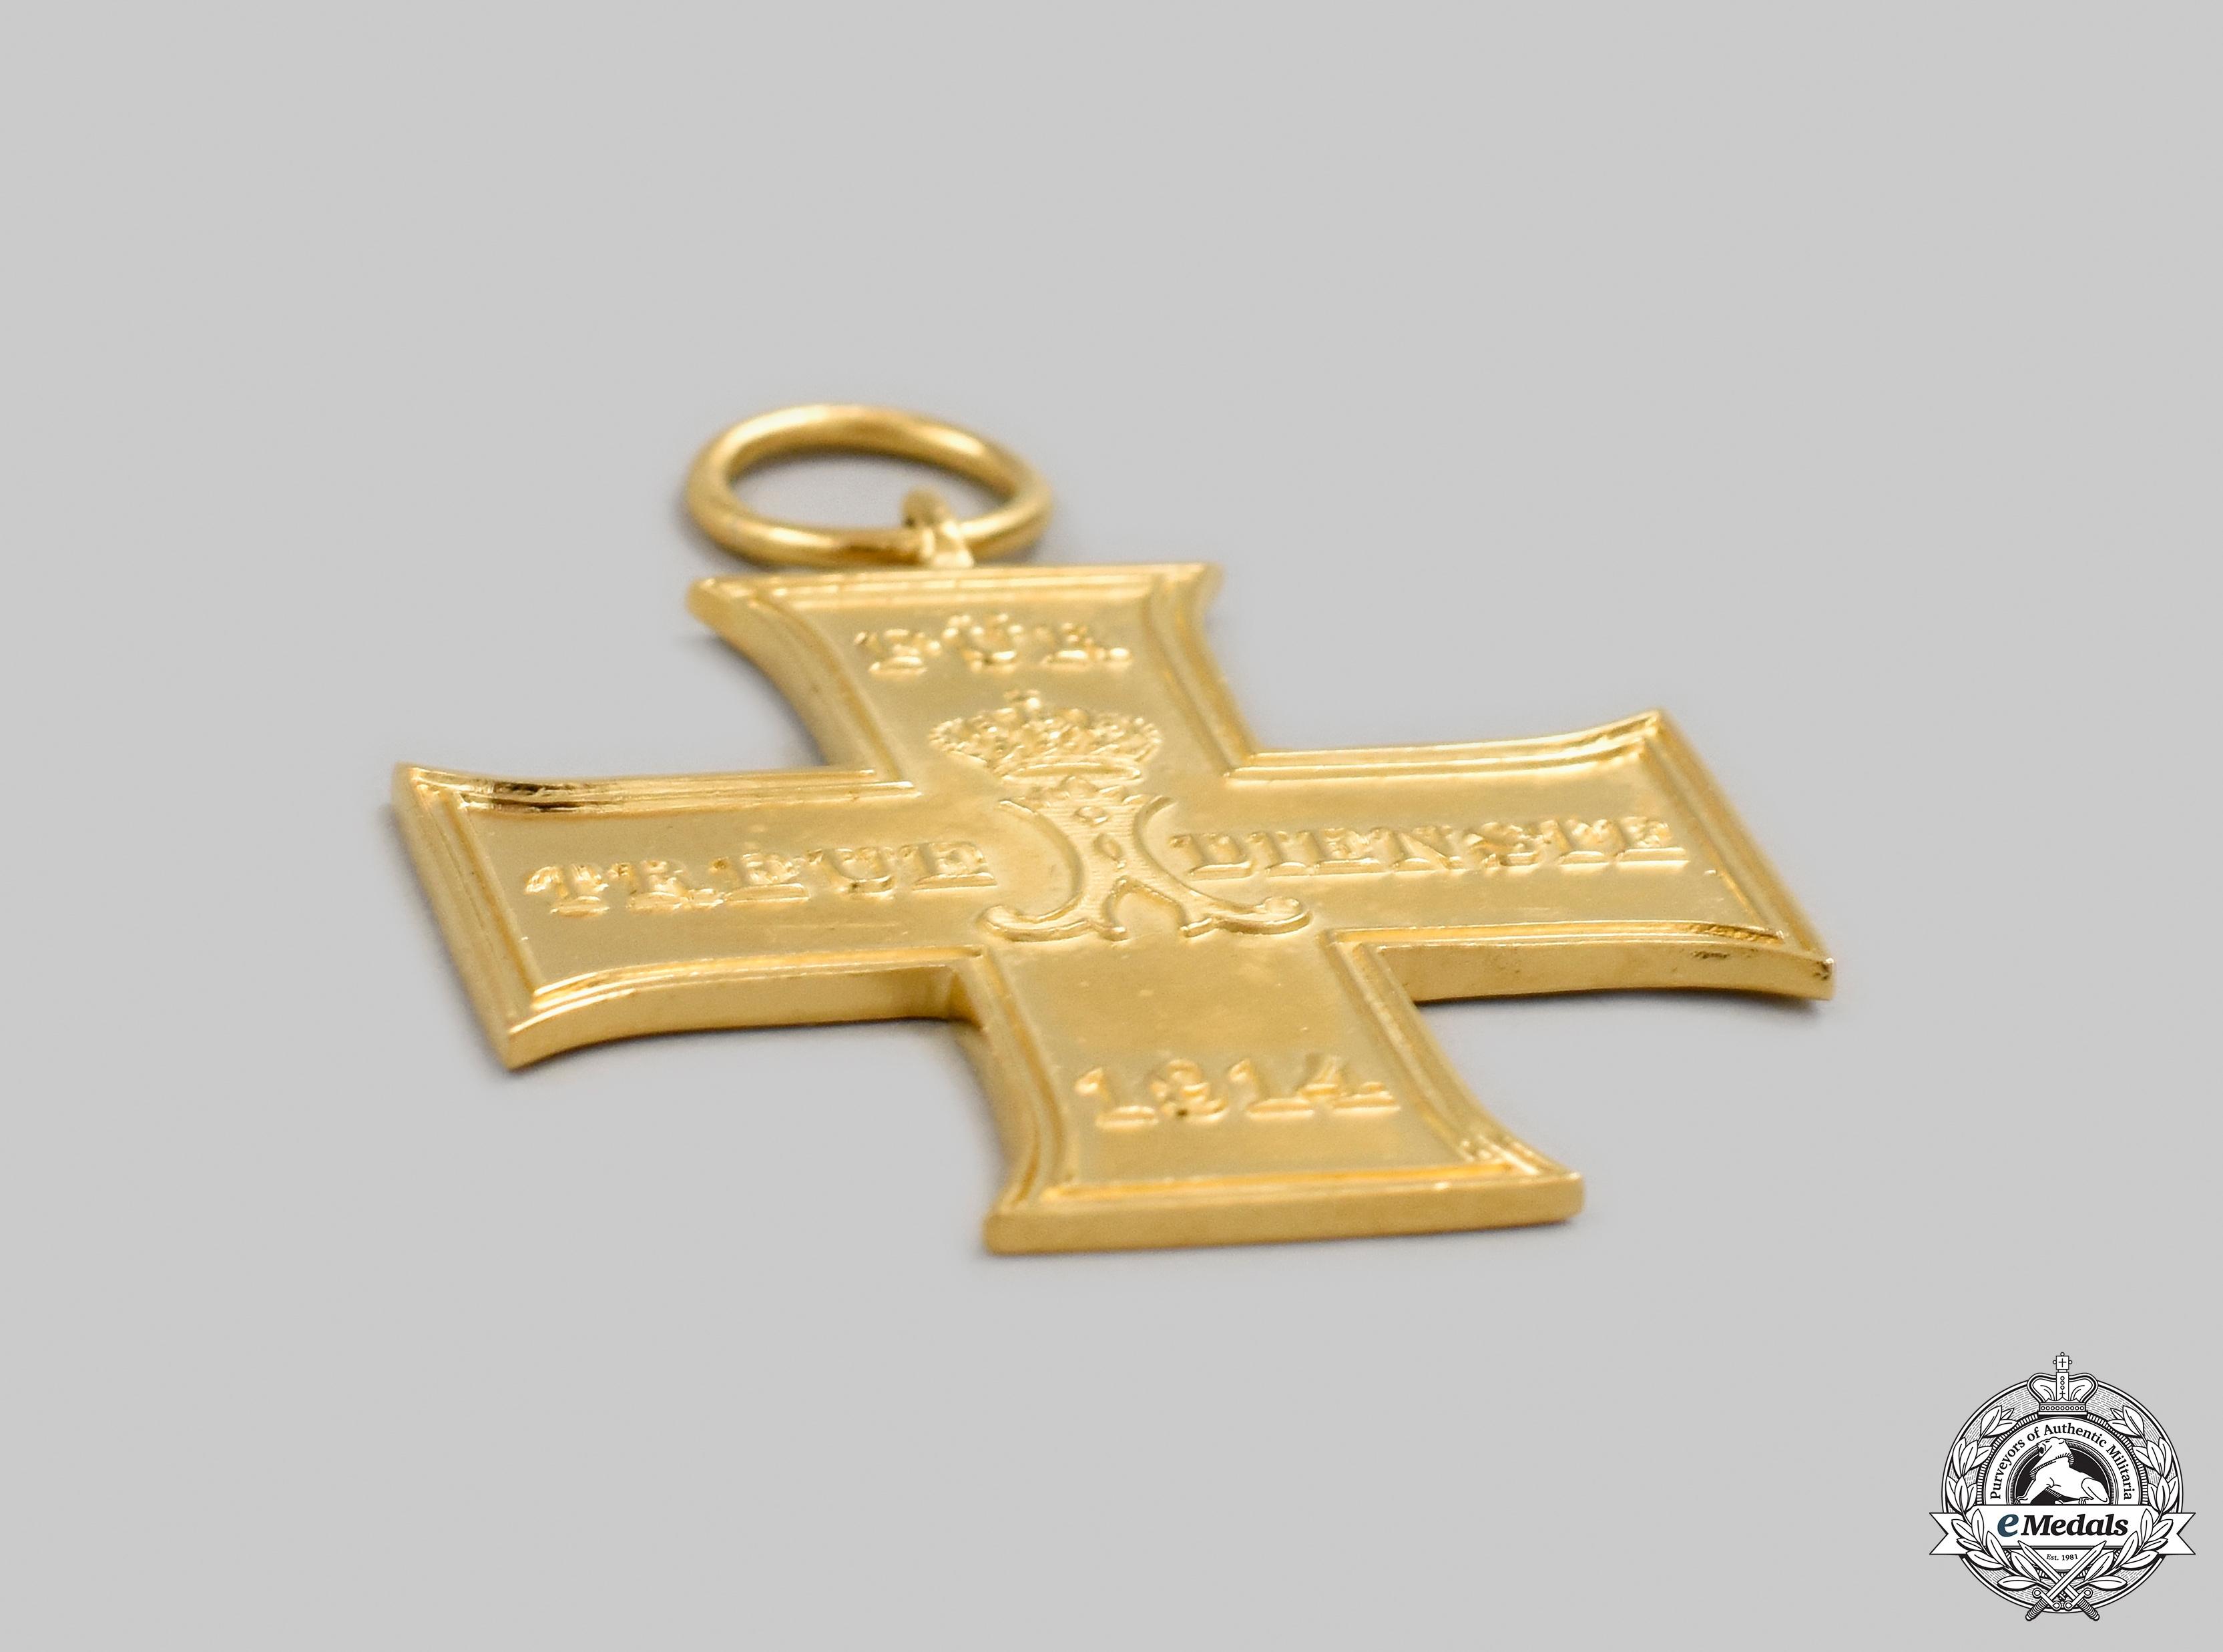 Schaumburg-Lippe, Principality. A Faithful Service Cross of 1914